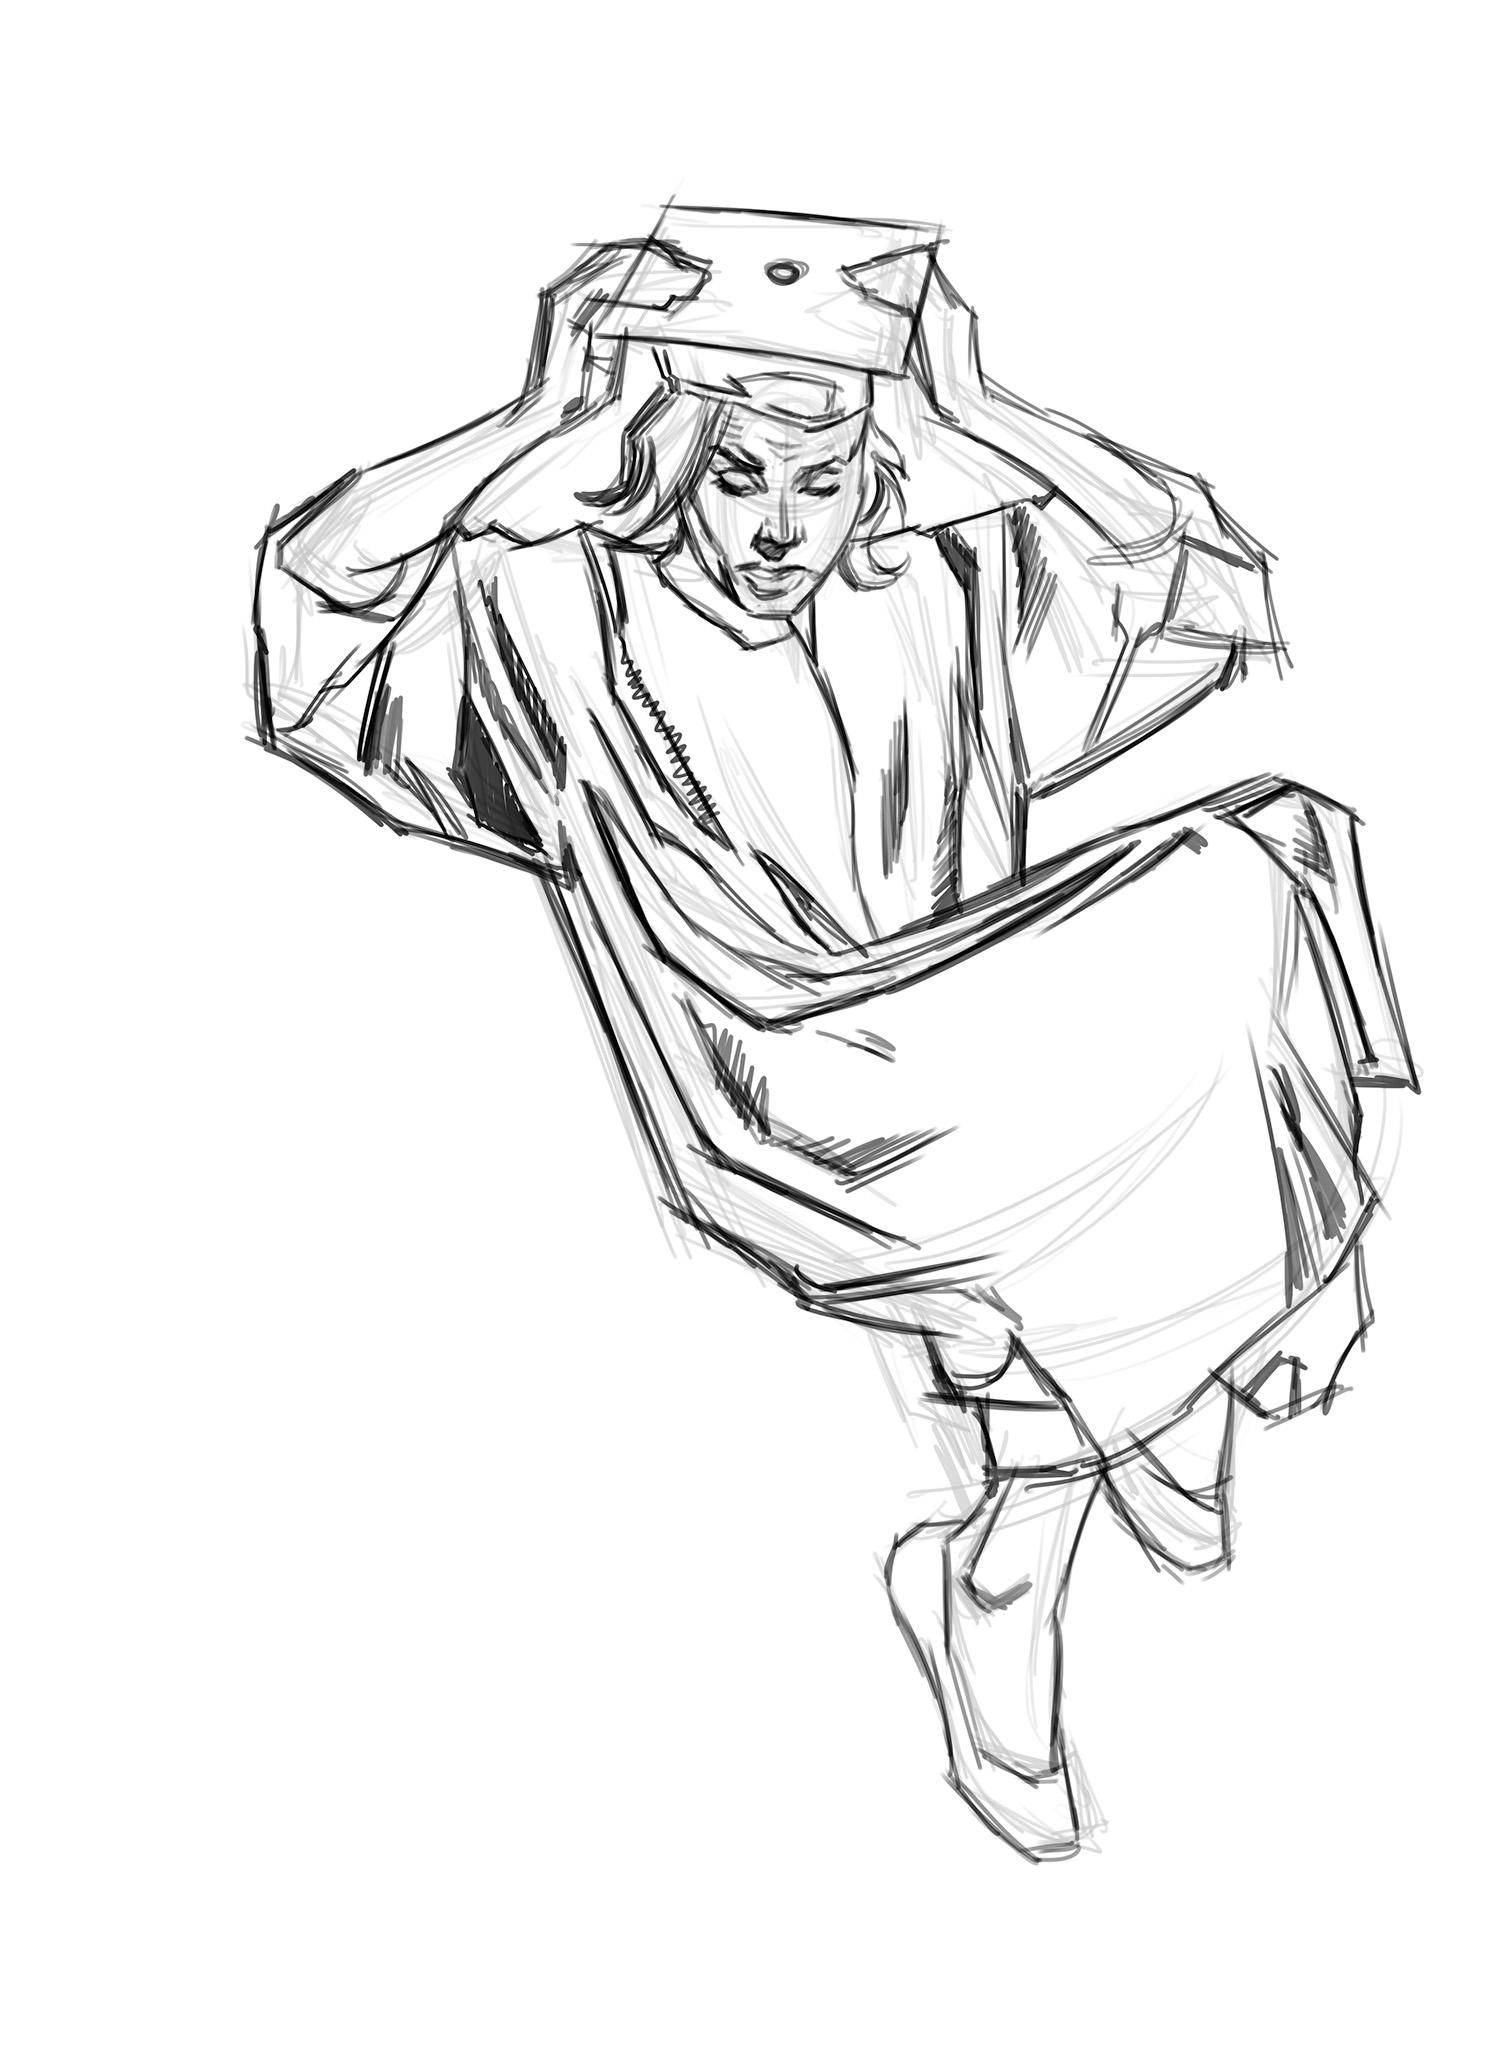 The rough sketch